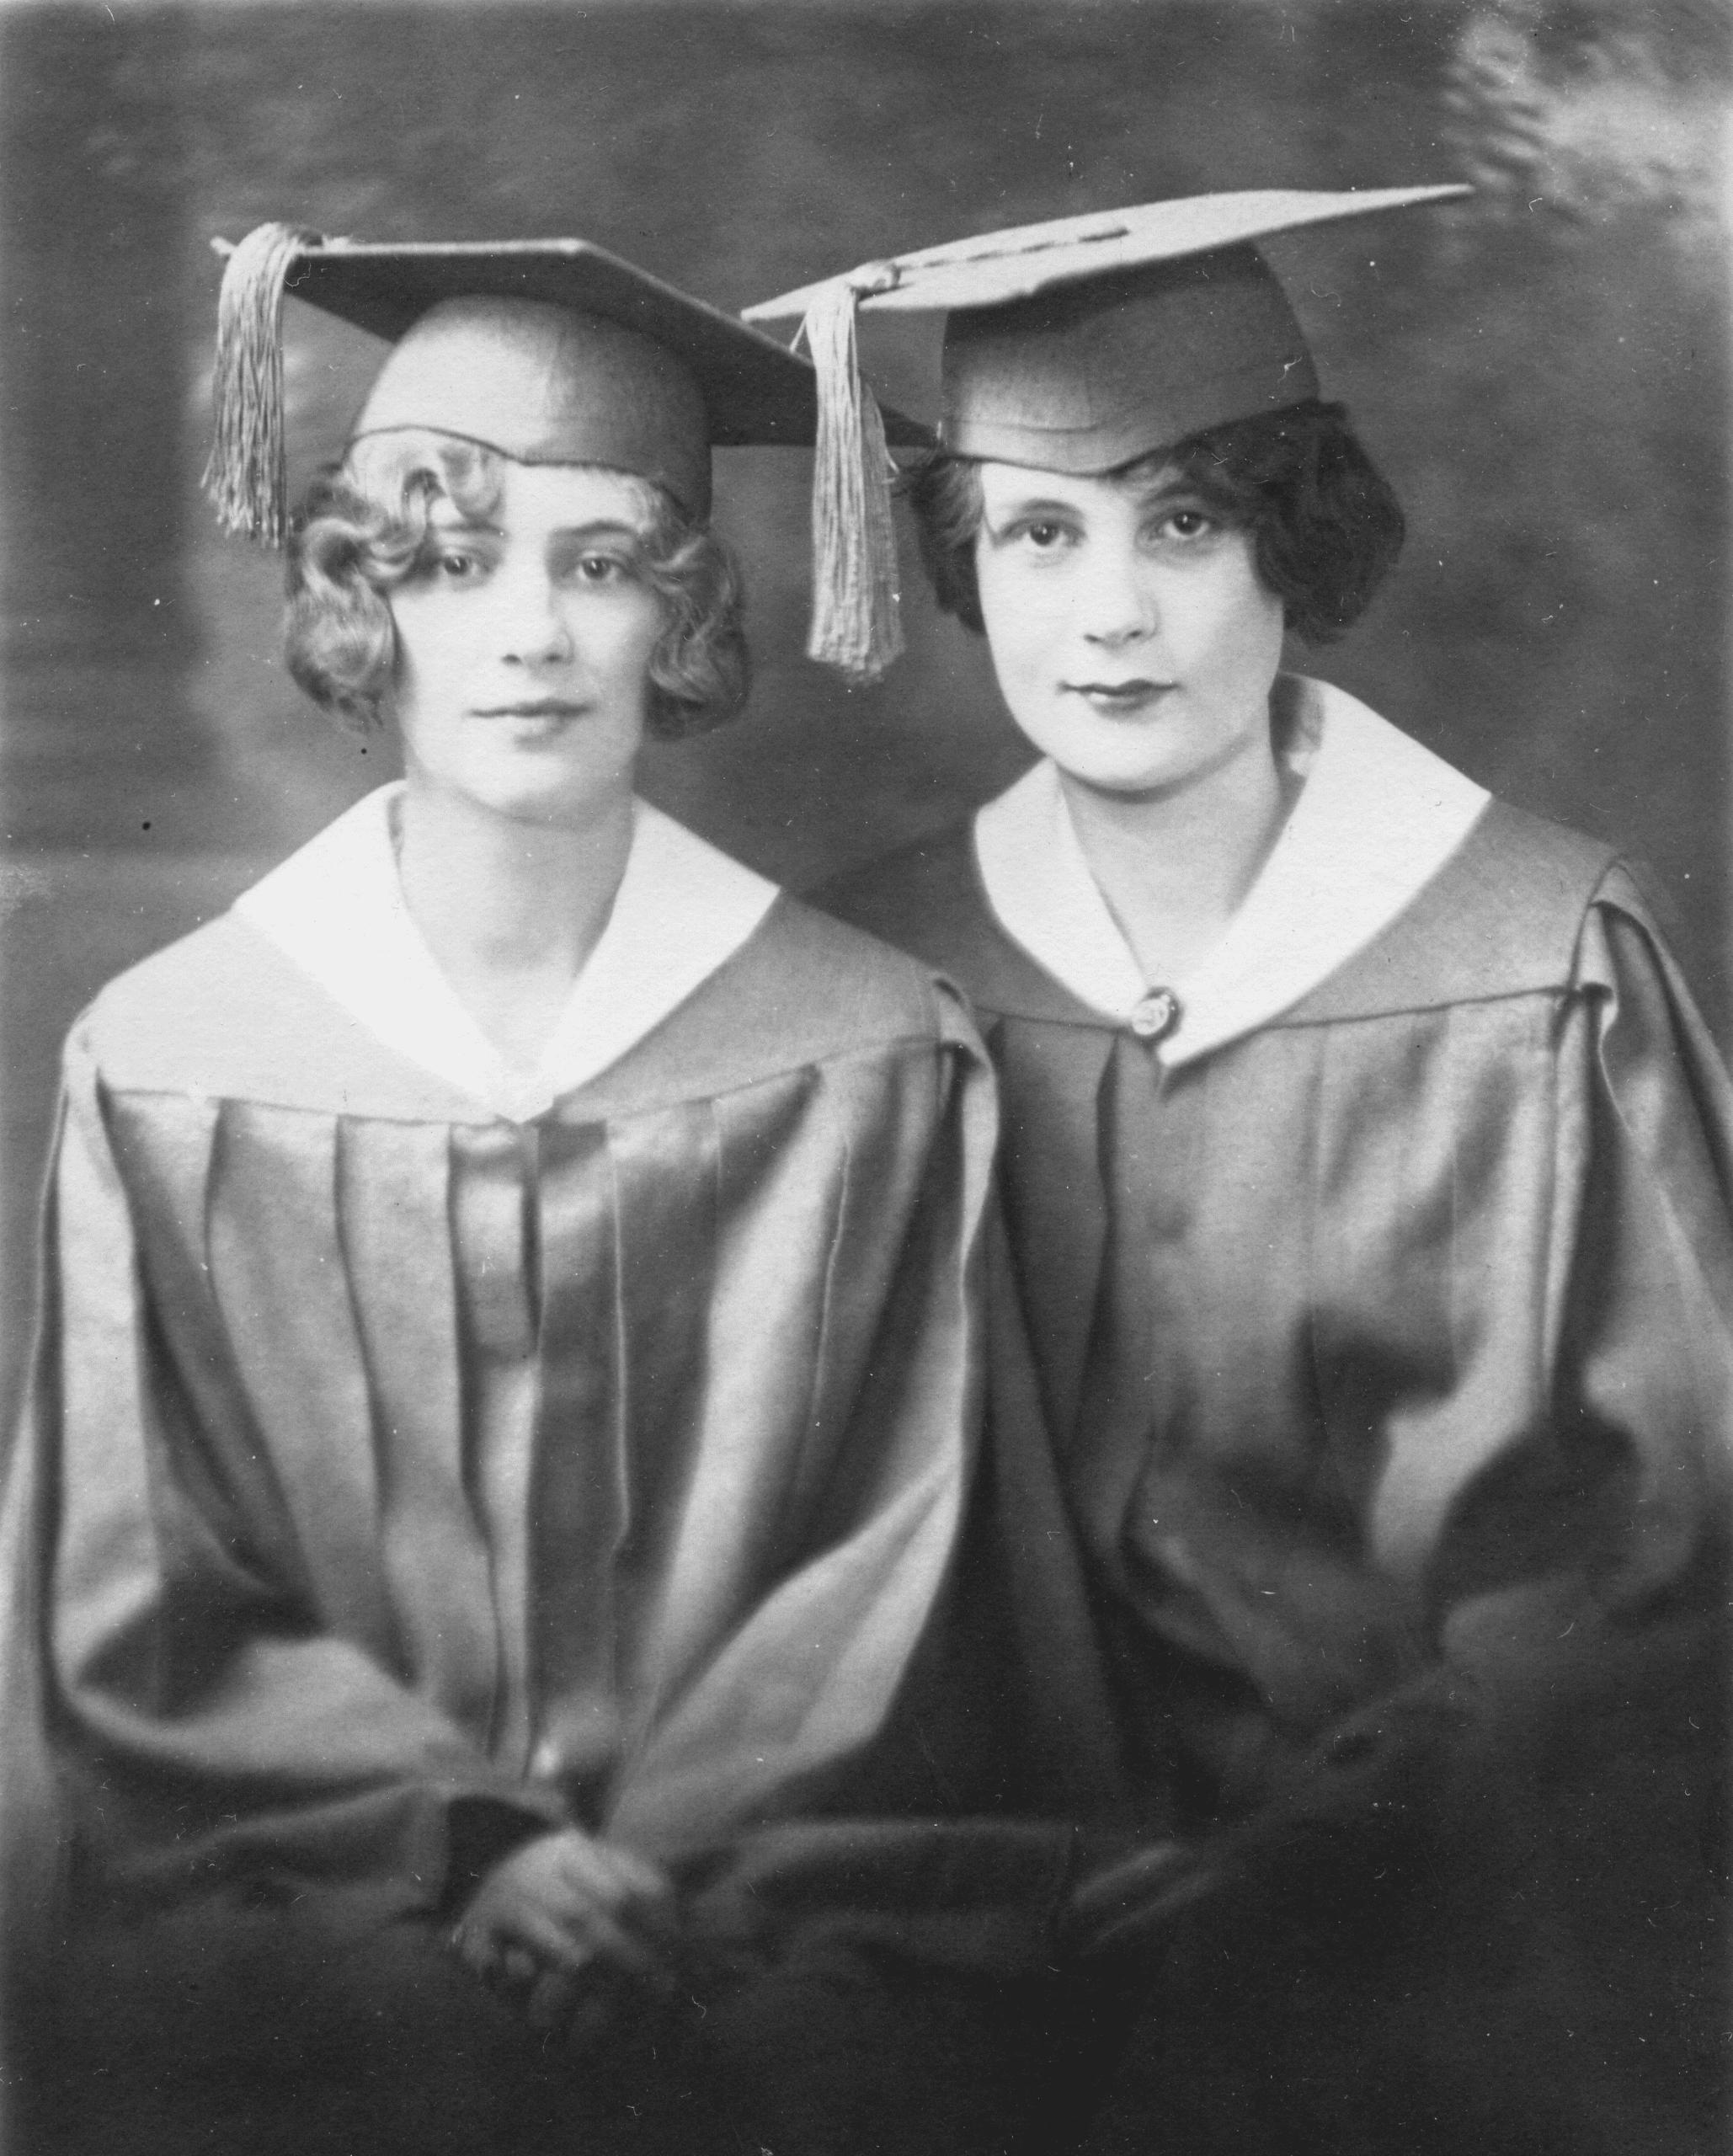 1928 – High School Graduates